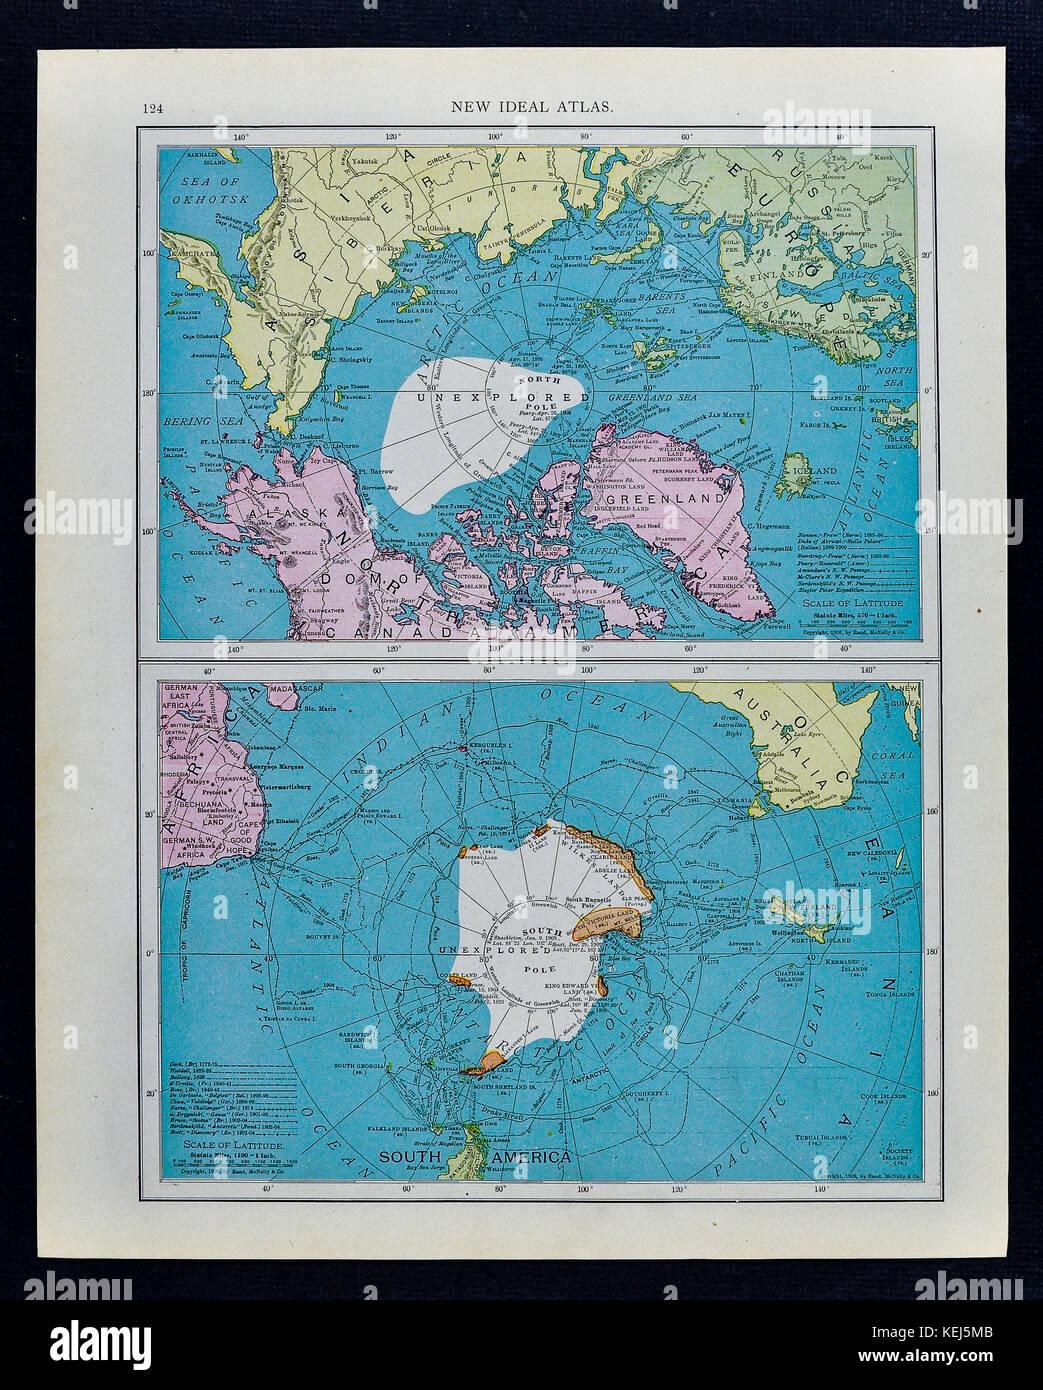 Nordpolarmeer Karte.Mcnally Antike Karte 1911 Südpol Antarktis Nordpol Nordpolarmeer